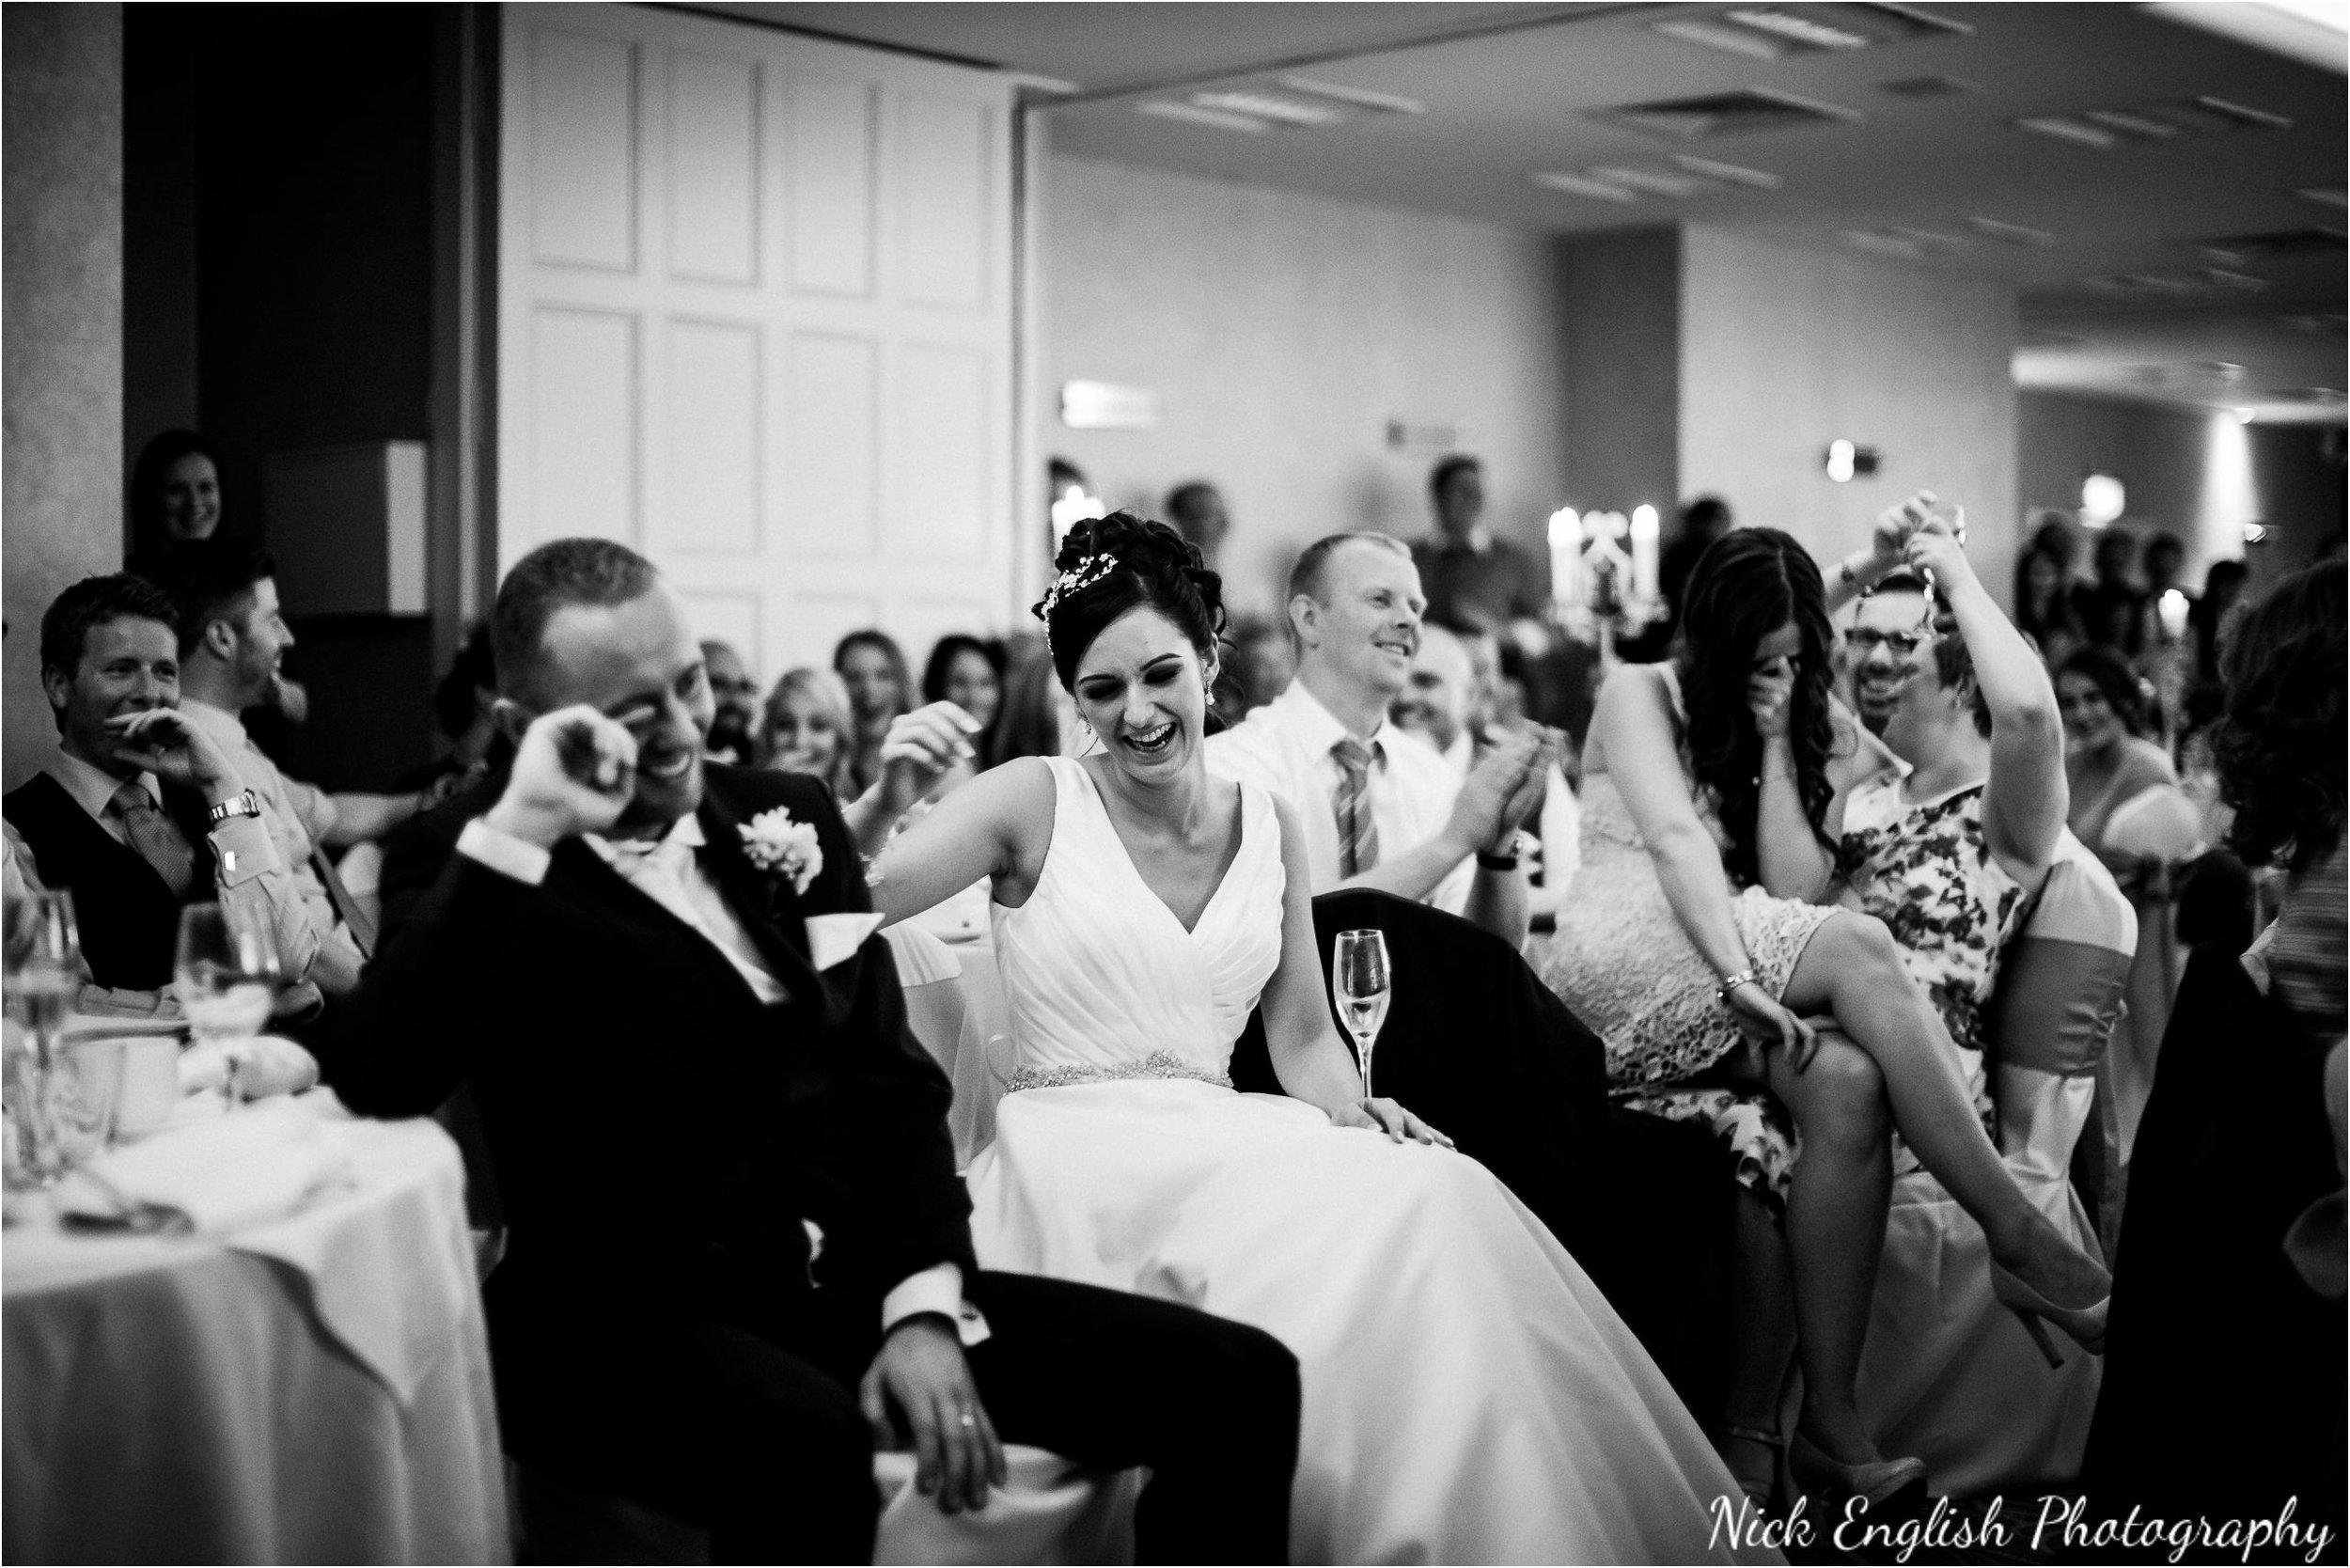 Emily David Wedding Photographs at Barton Grange Preston by Nick English Photography 191jpg.jpeg